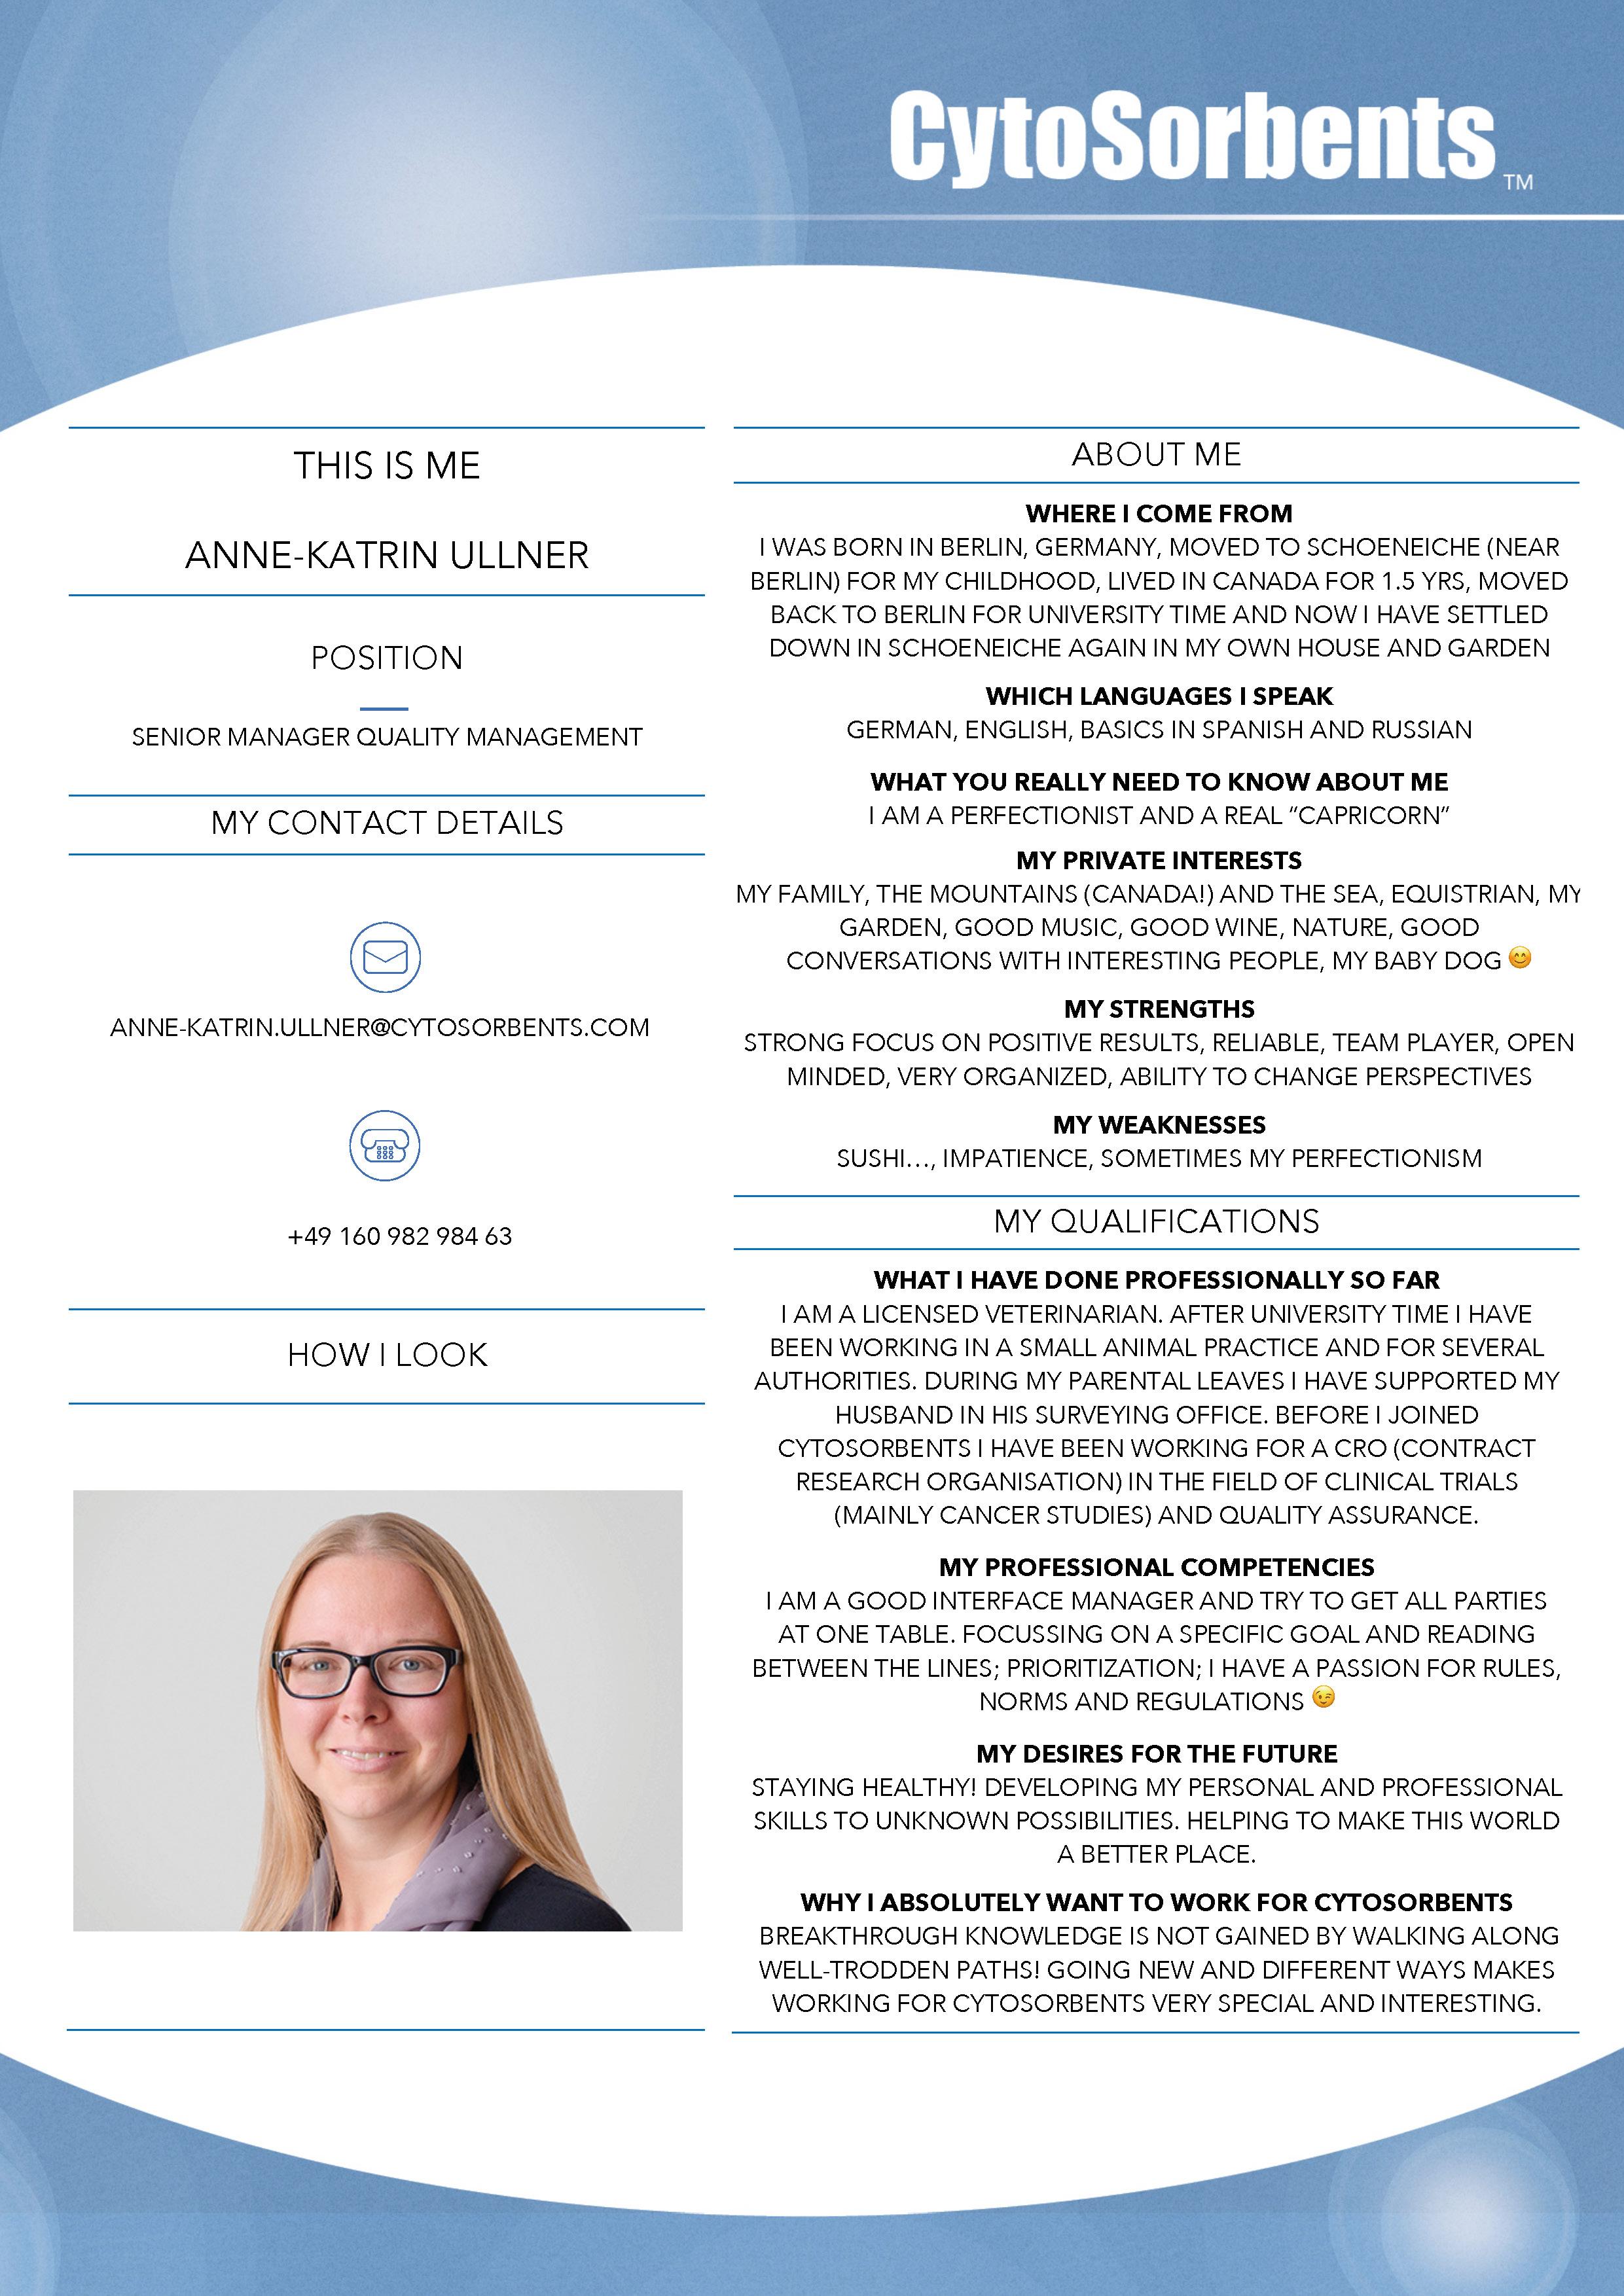 CytoSorb_Steckbrief_Anne-Katrin_Ullner-4